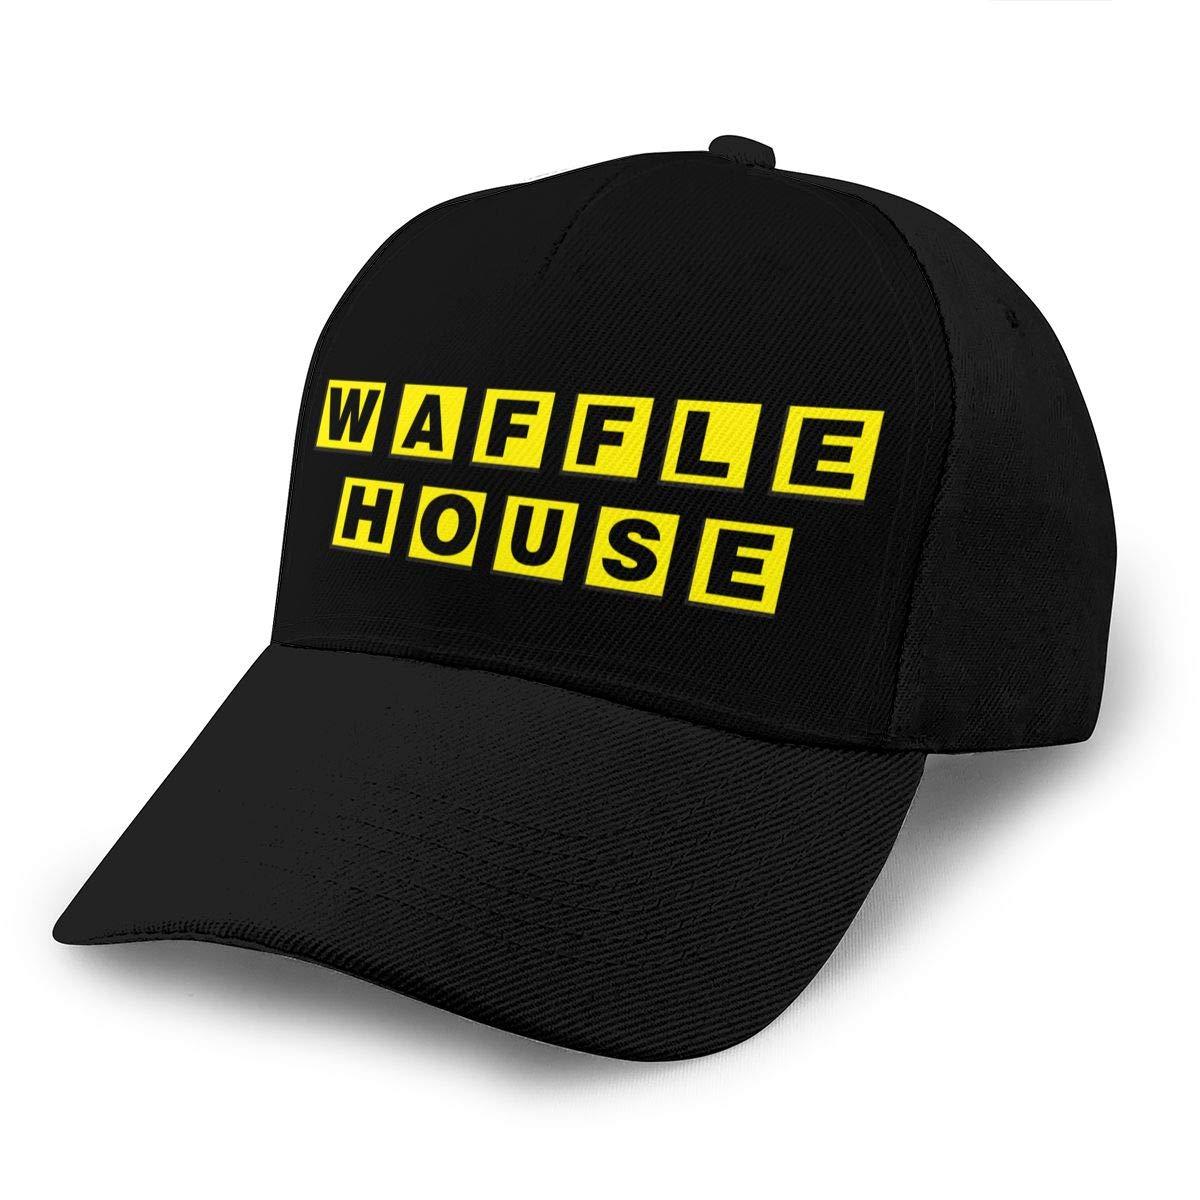 Adjustable Women Men Waffle-House-Logo Print Baseball Cap Flat Brim Cap Hats Hip Hop Snapback Sun Hat Boys Girls Black by Apolonia